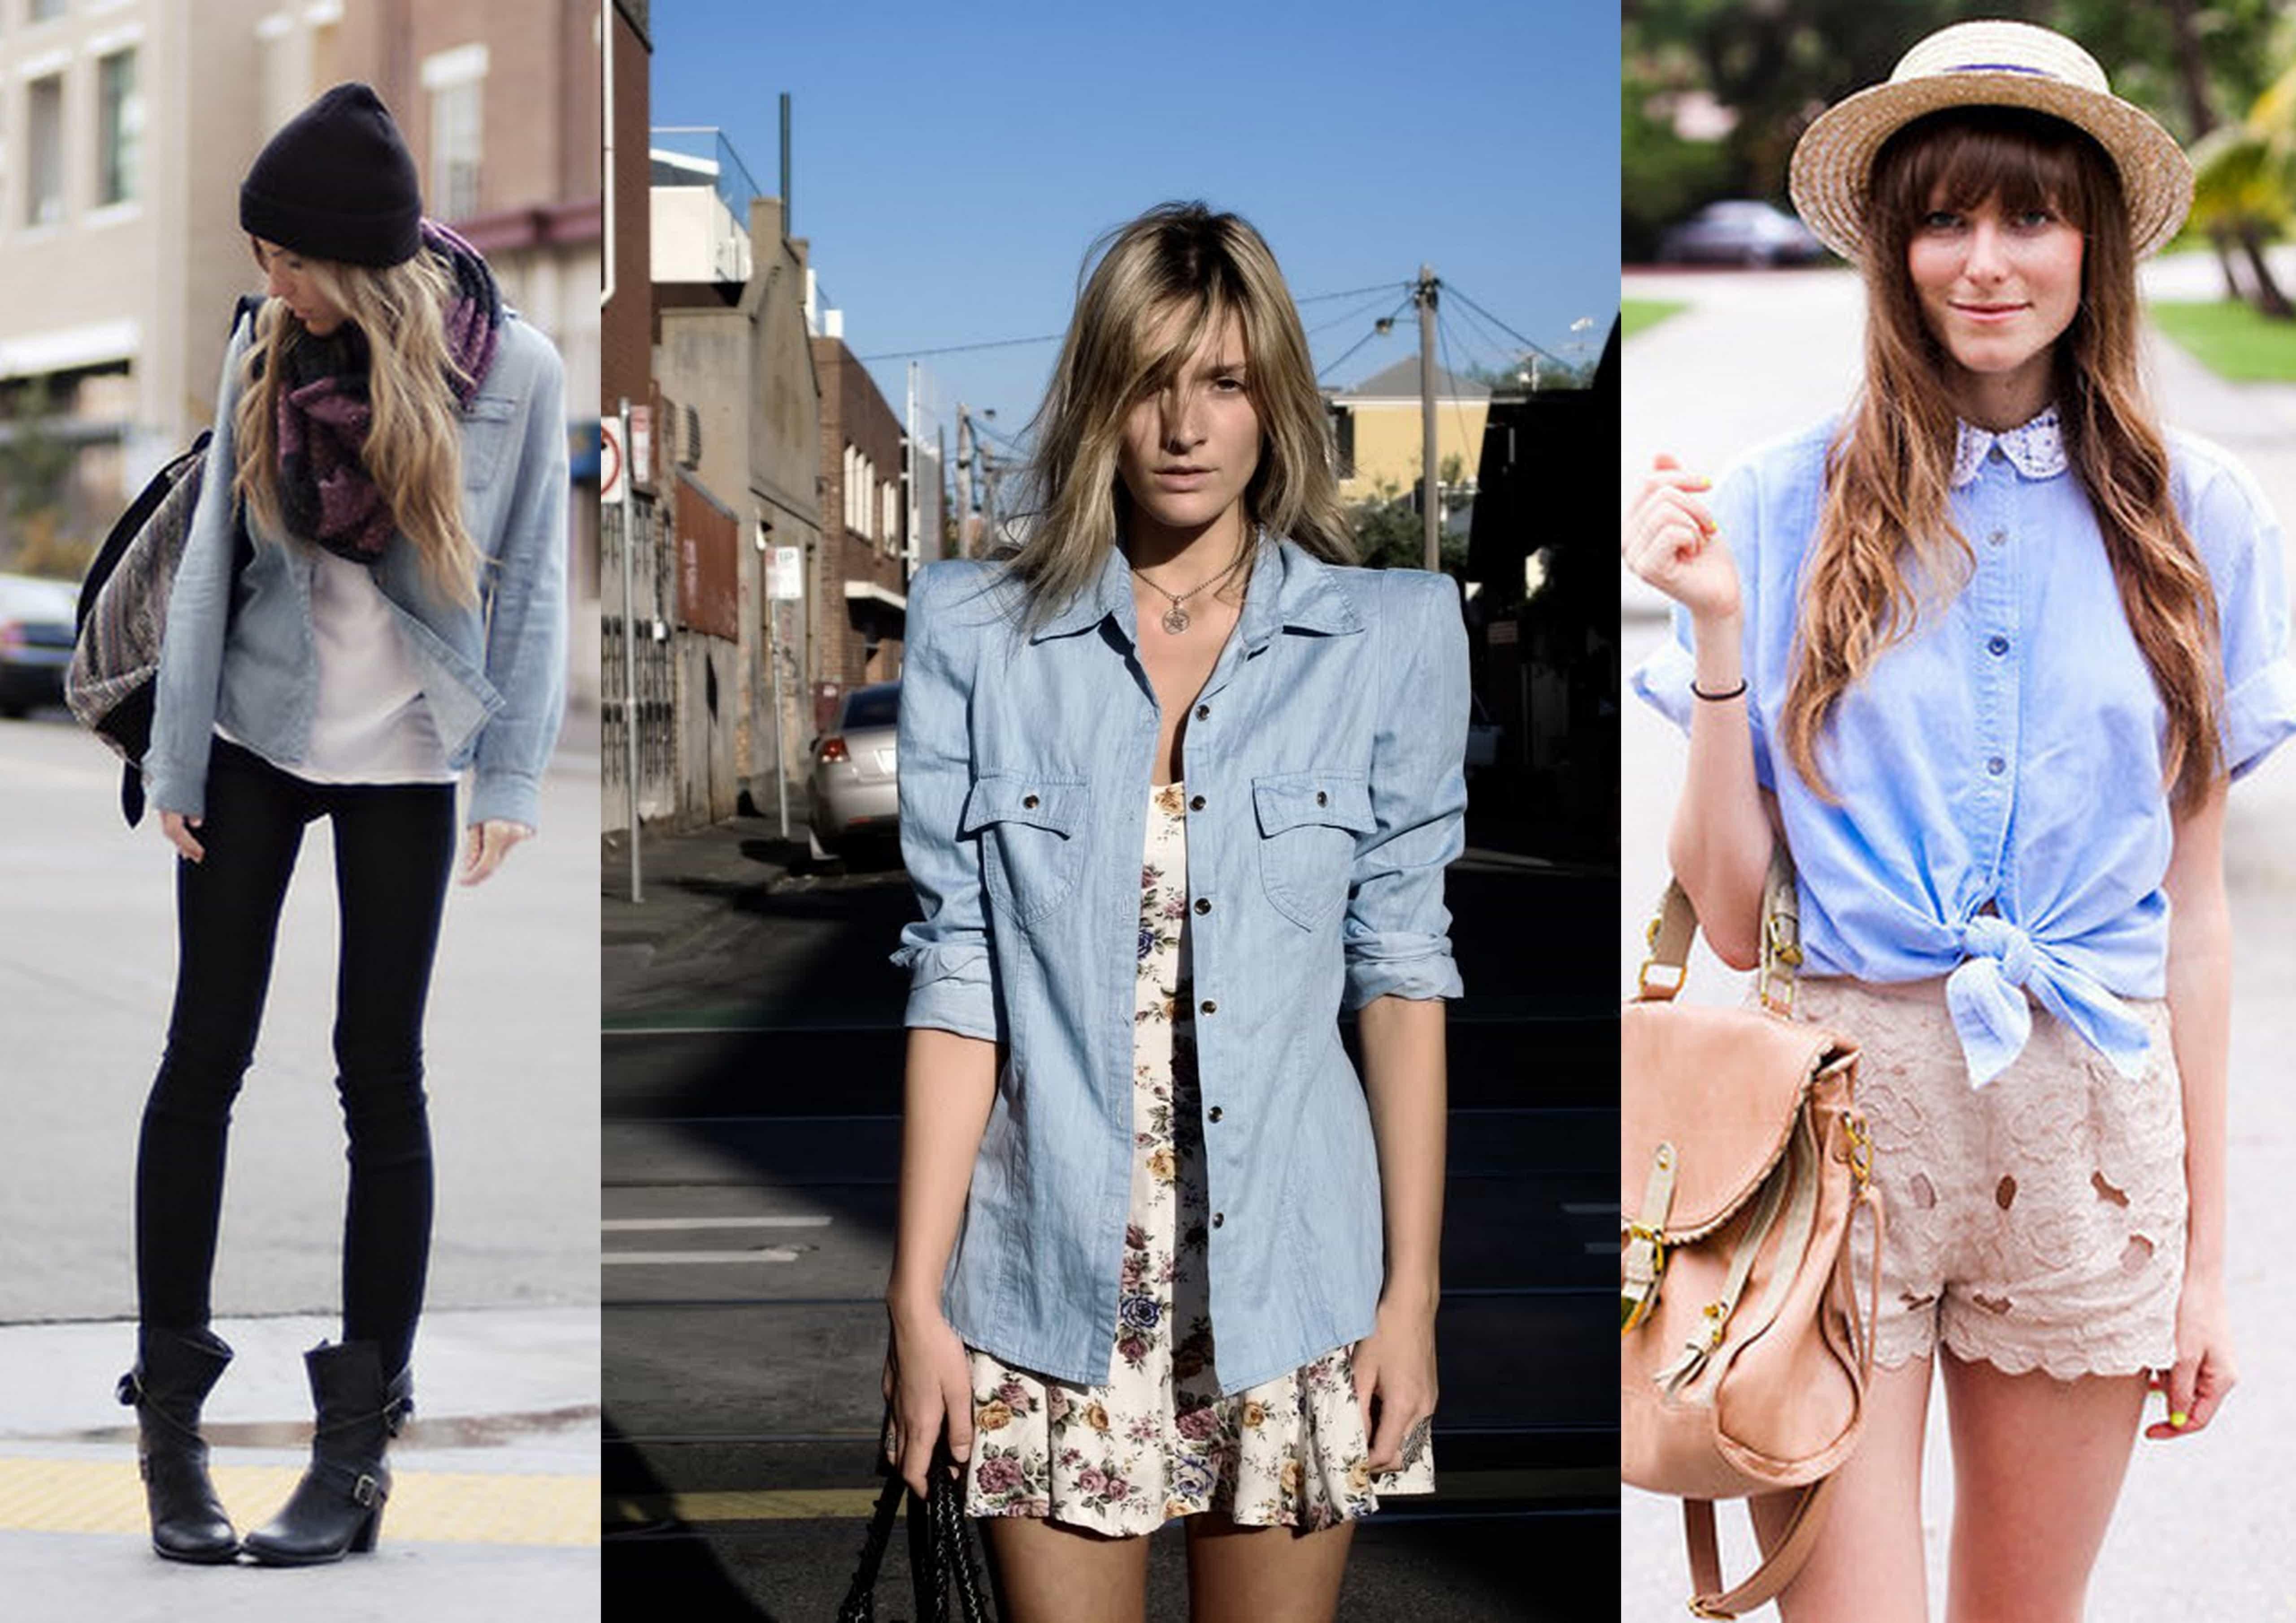 camisa jeans 5 - Camisa Jeans: como usar